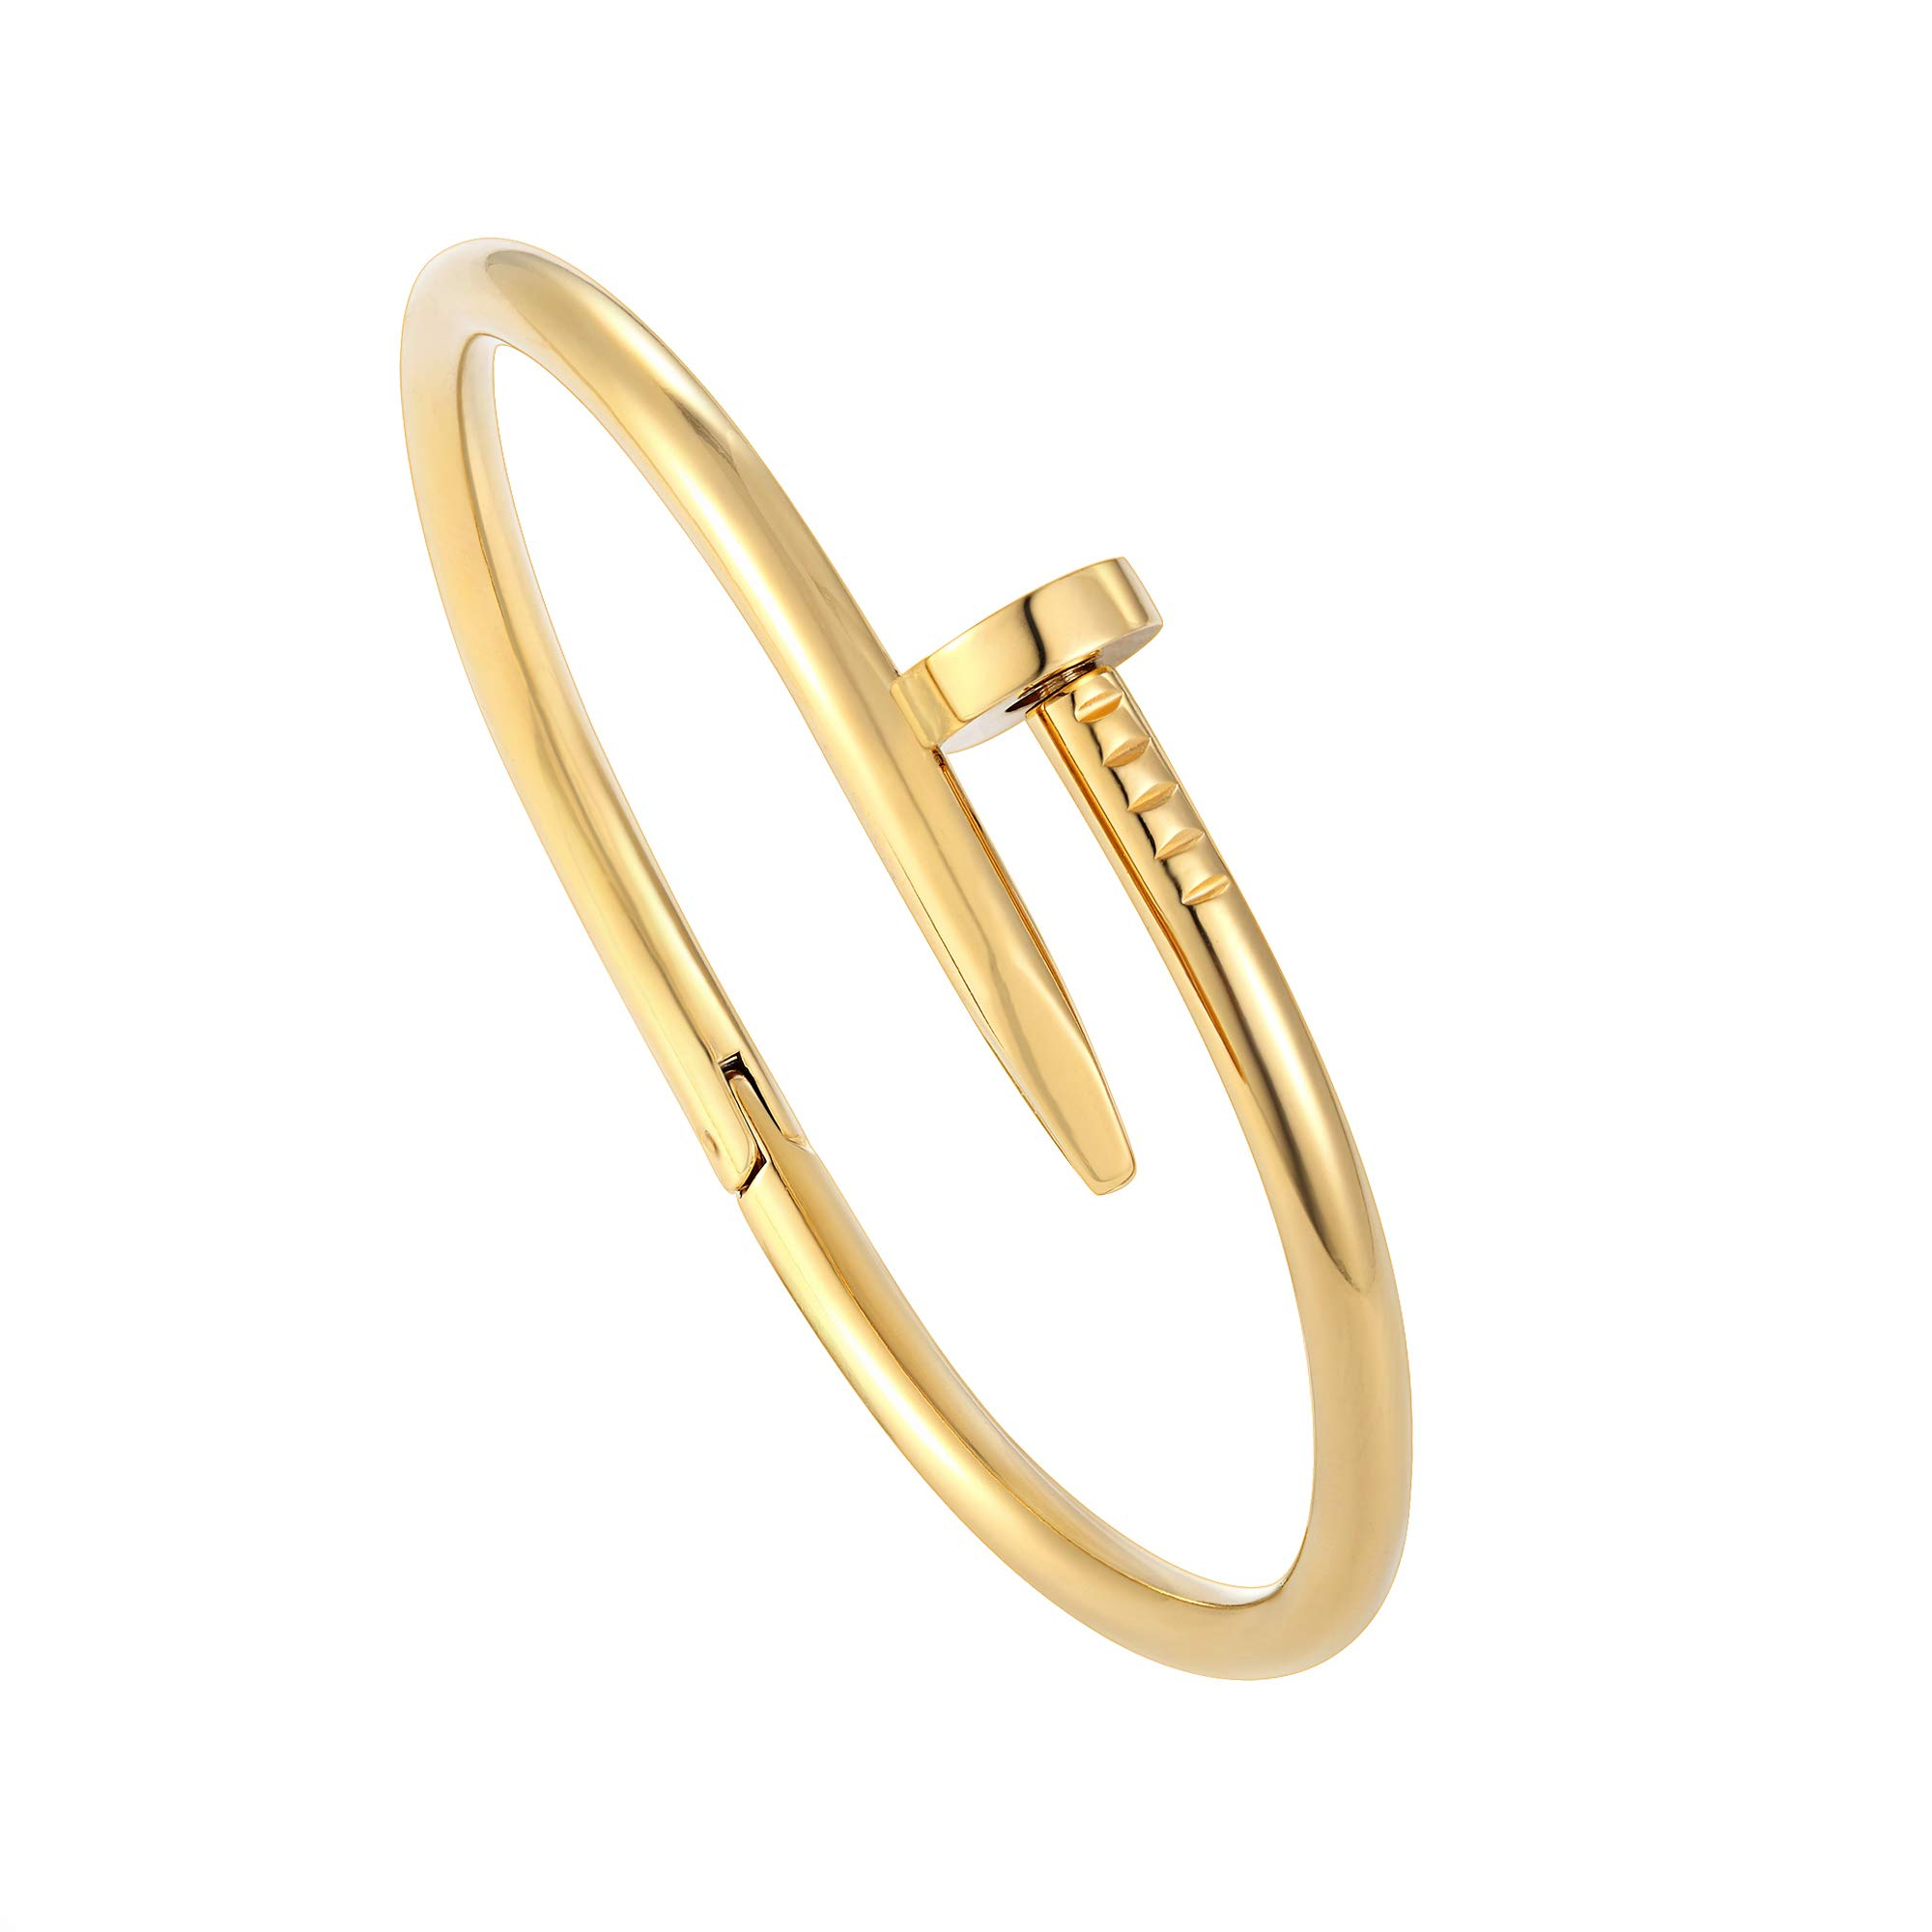 Z.RACLE Nail Bracelets for Women Inspired Stainless Steel Love Bangle Bracelets Gold 6.3IN